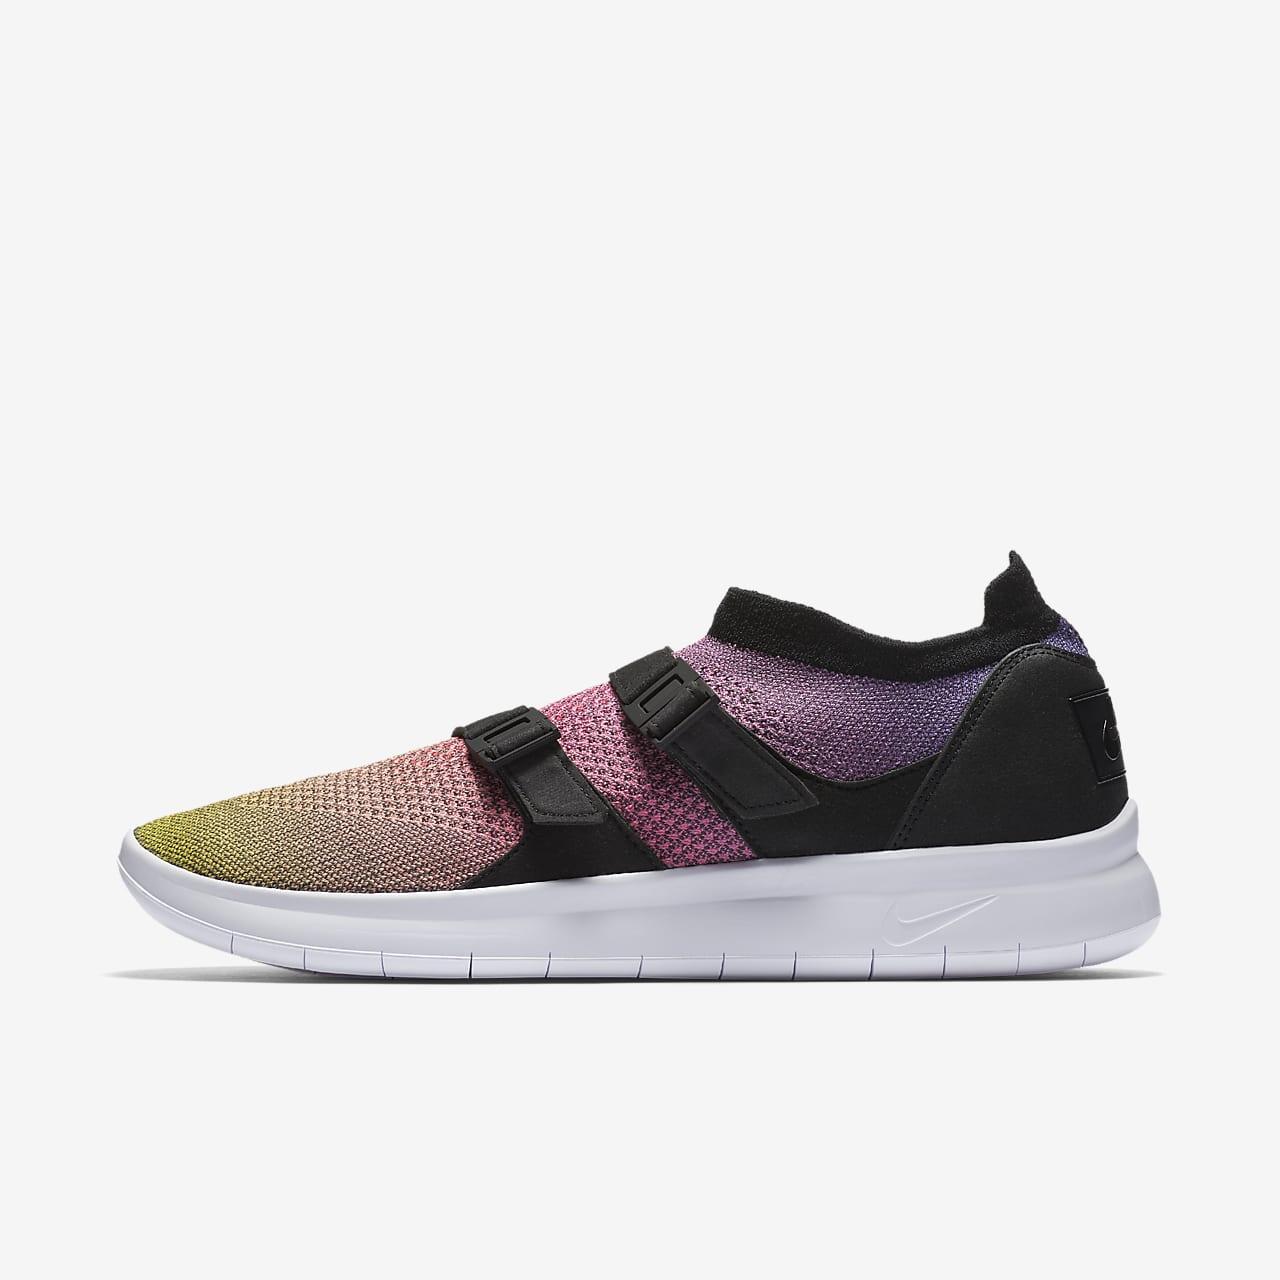 Calzado para hombre Nike Air Sock Racer Premium Flyknit